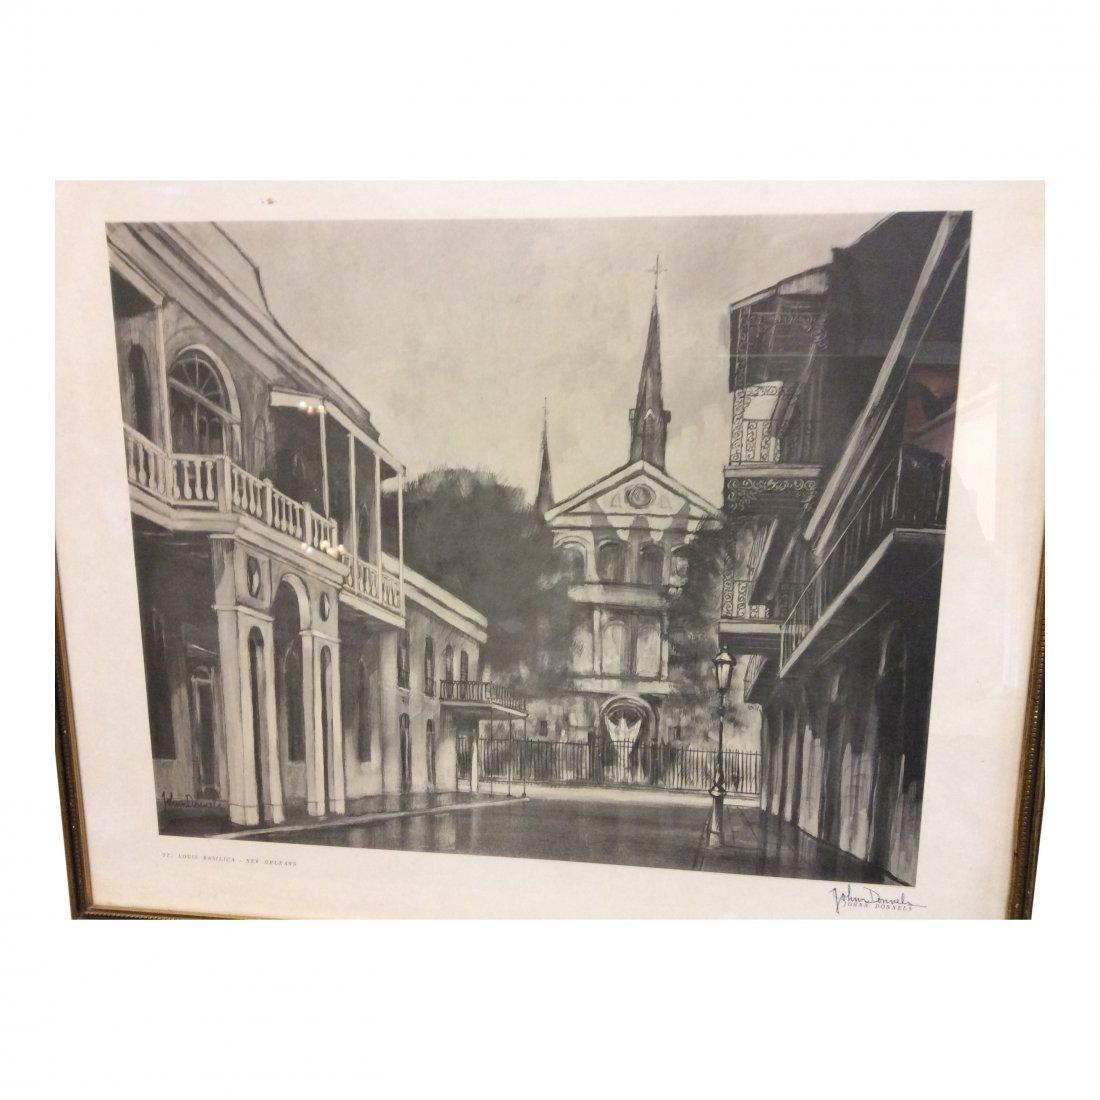 John Donnels: Print of St. Louis Basilica, 1960's